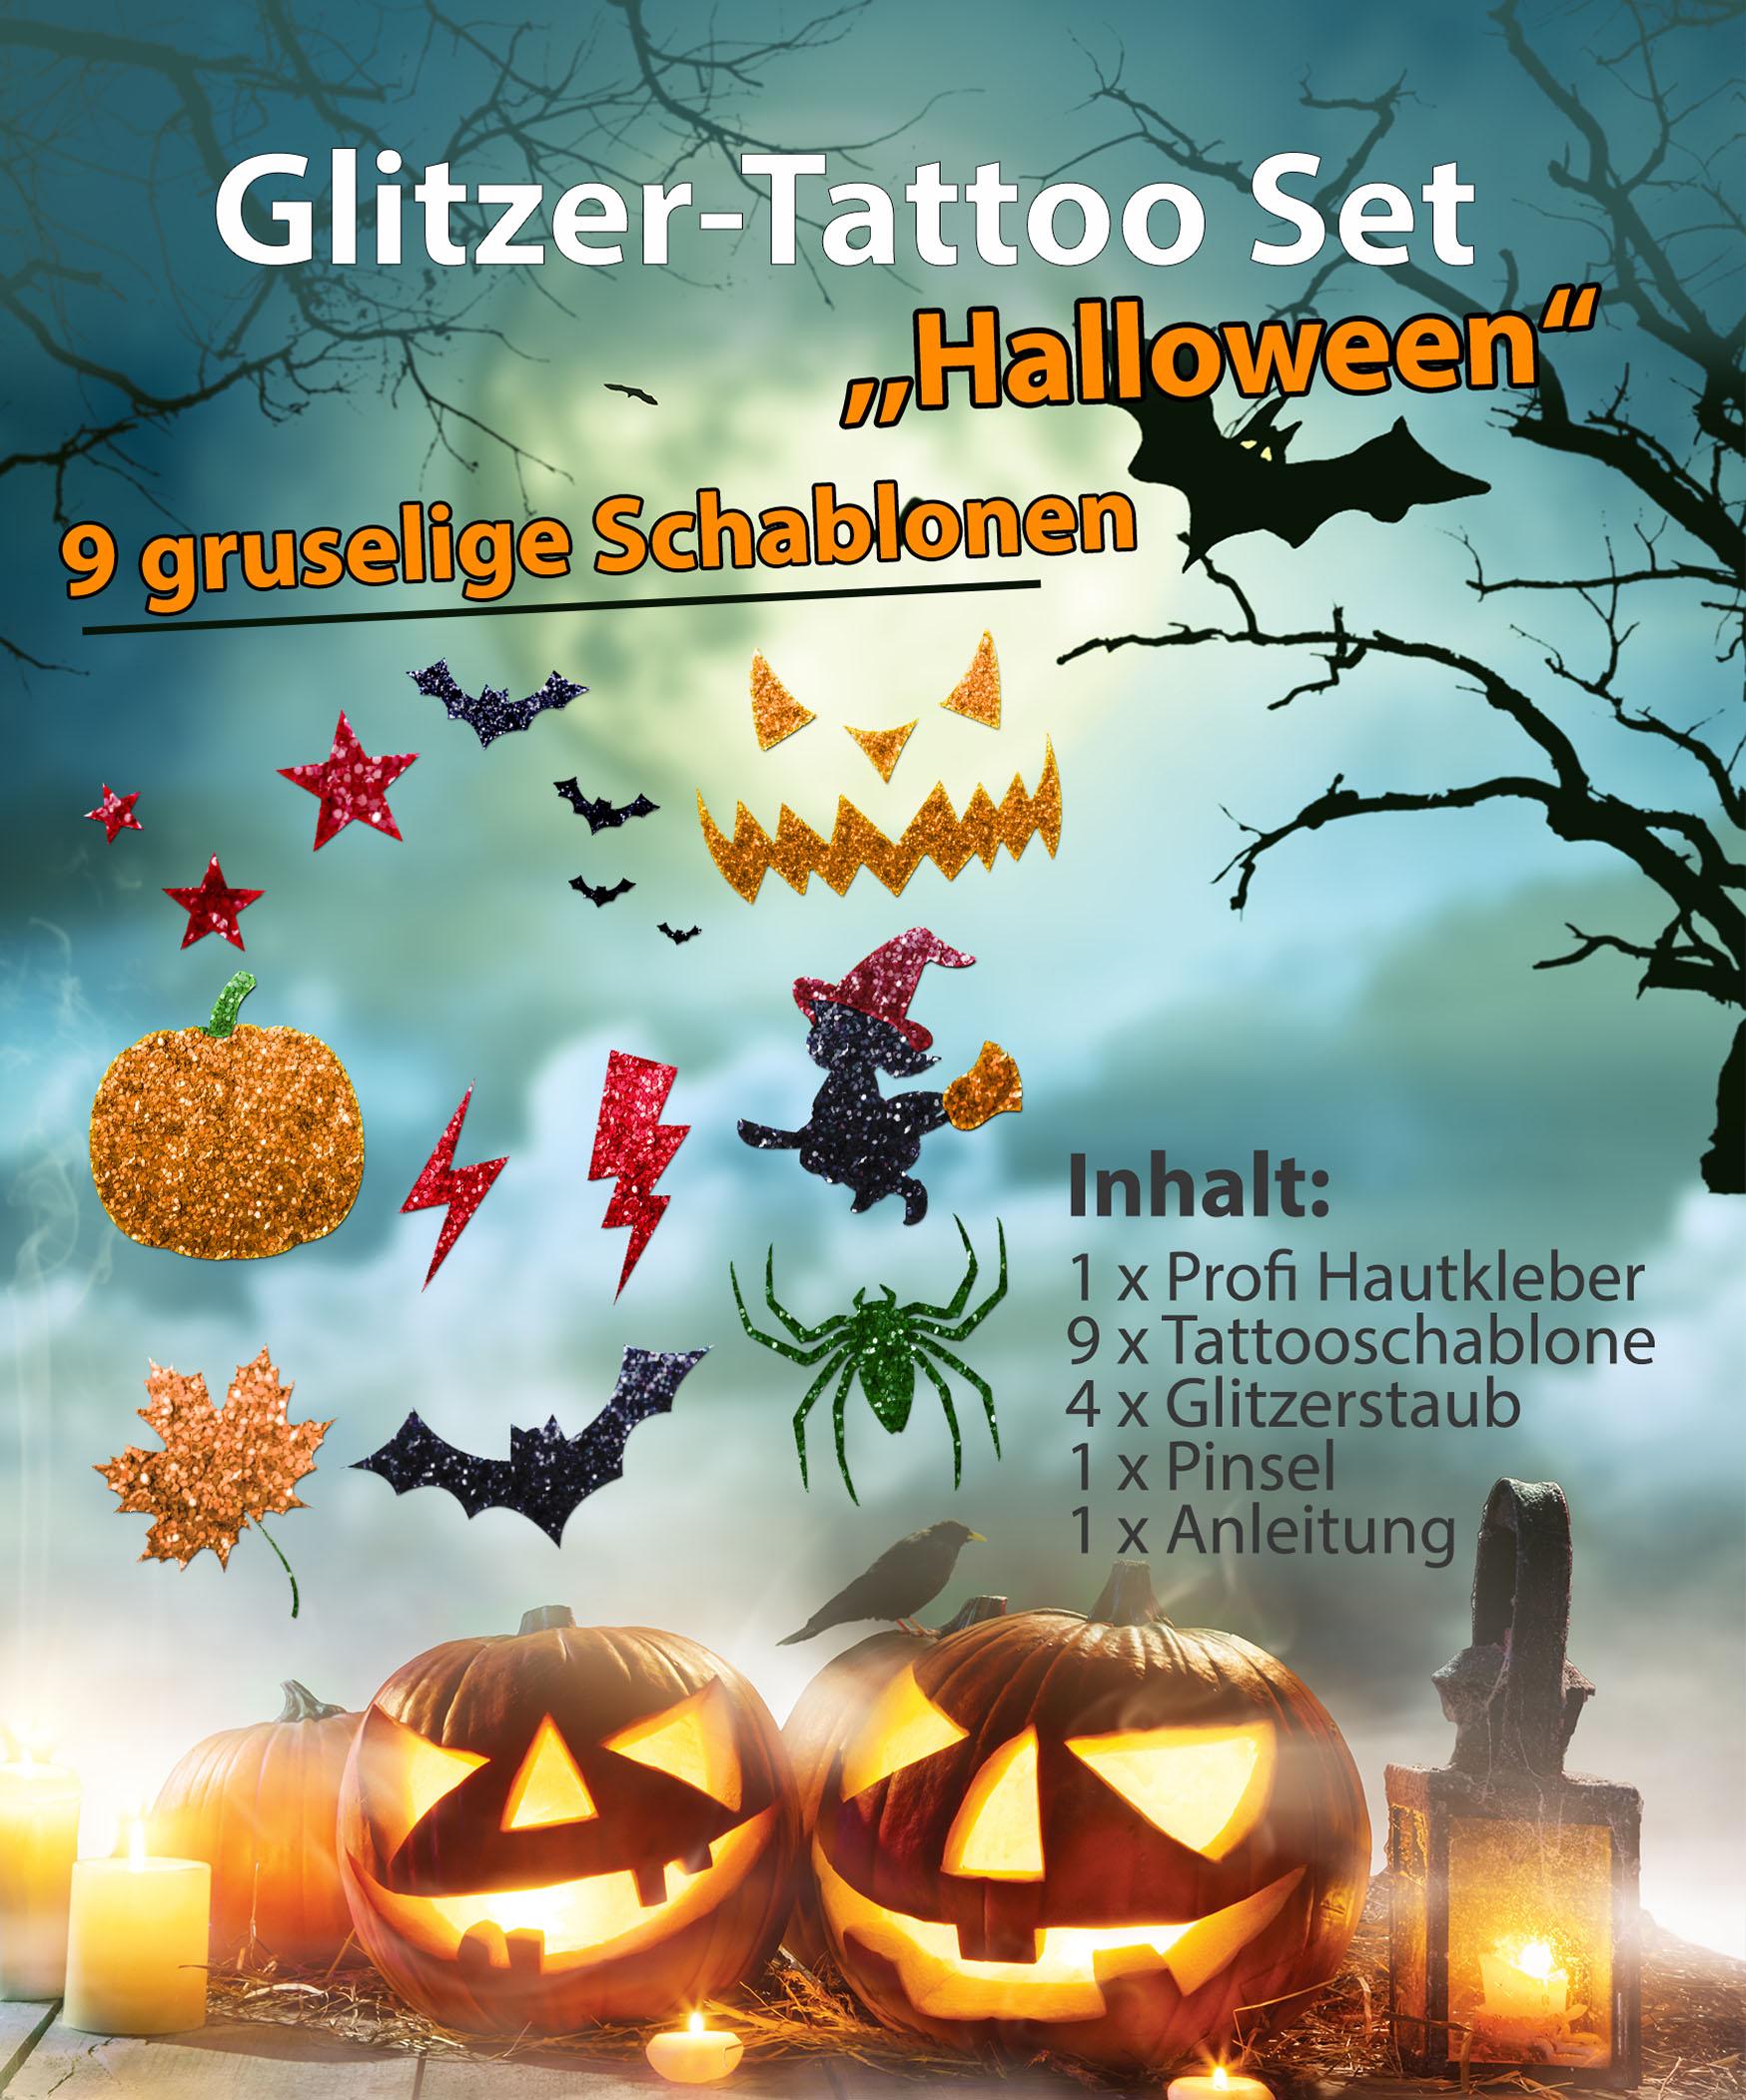 Glitzer Tattoo Set Kinder HALLOWEEN mit Profihautkleber, 1 Pinsel, 4 Glitzer, 9 Tattooschablonen